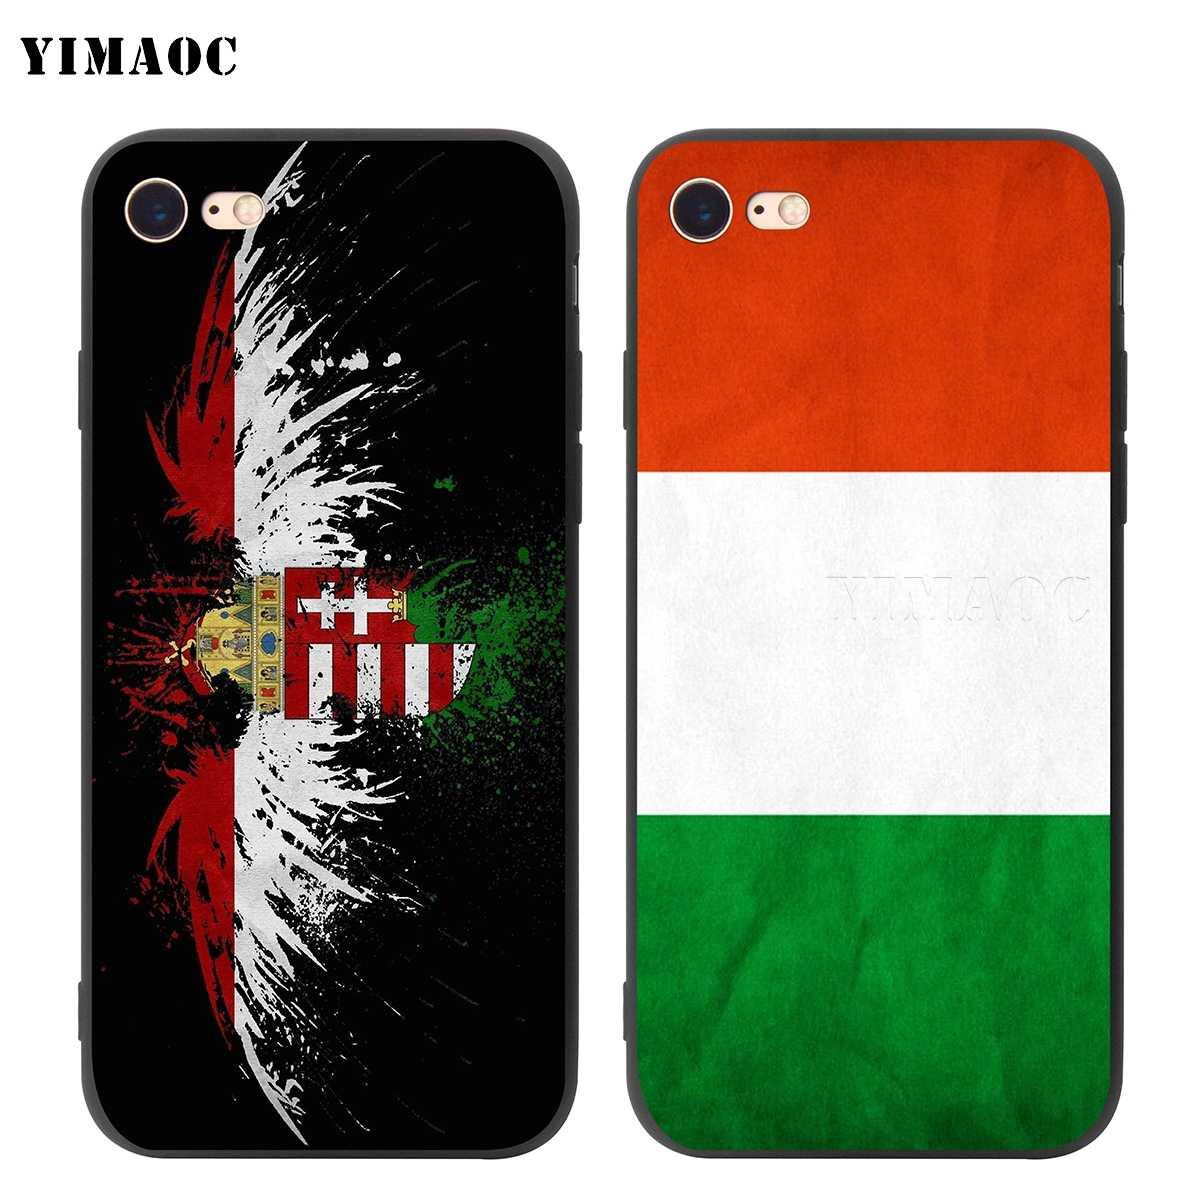 Мягкий силиконовый чехол YIMAOC для iPhone 11 Pro XS Max XR X 8 7 6 6S Plus 5 5S se